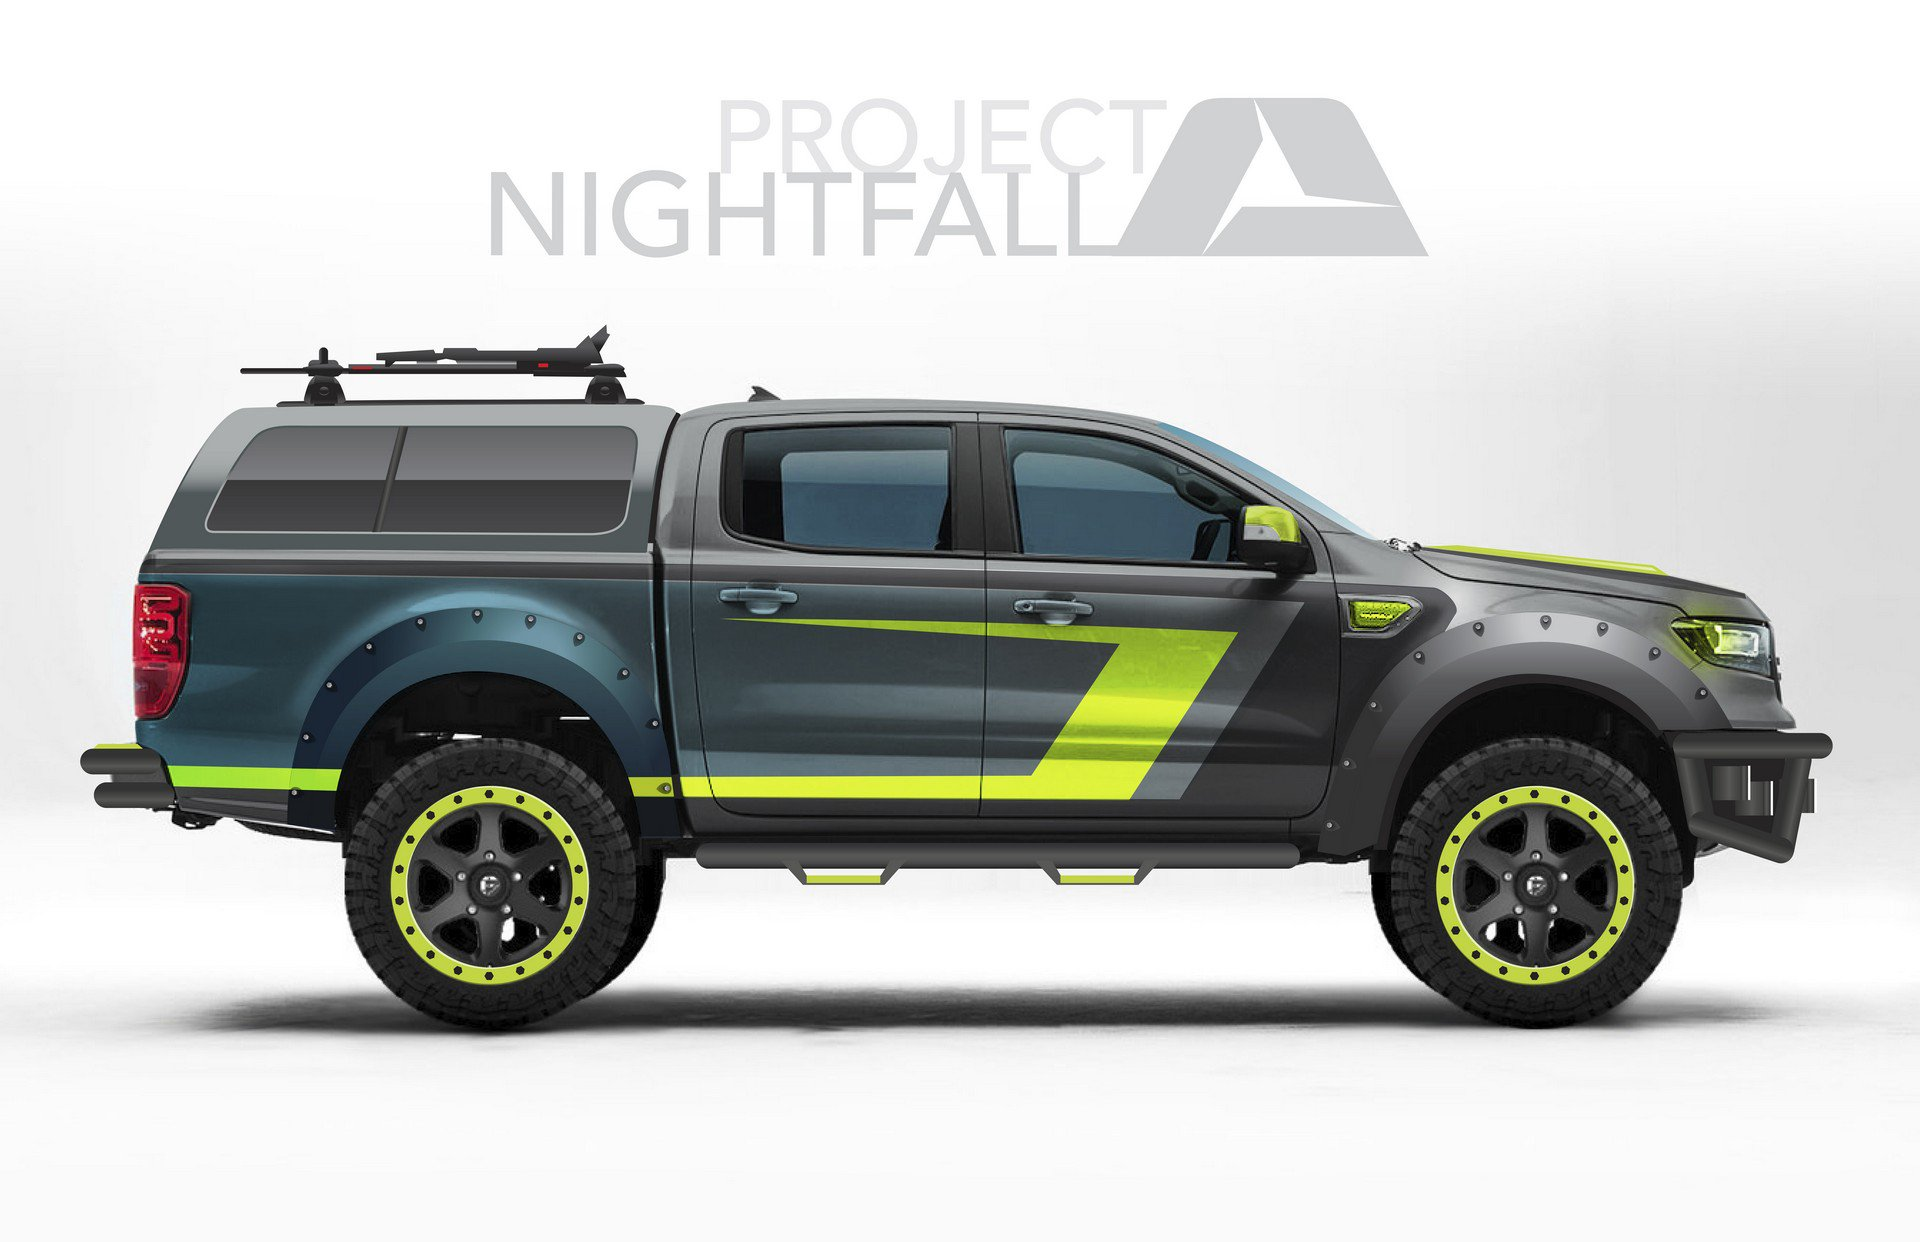 Ford Reveals 2019 Ranger Concept Trucks At Sema Show